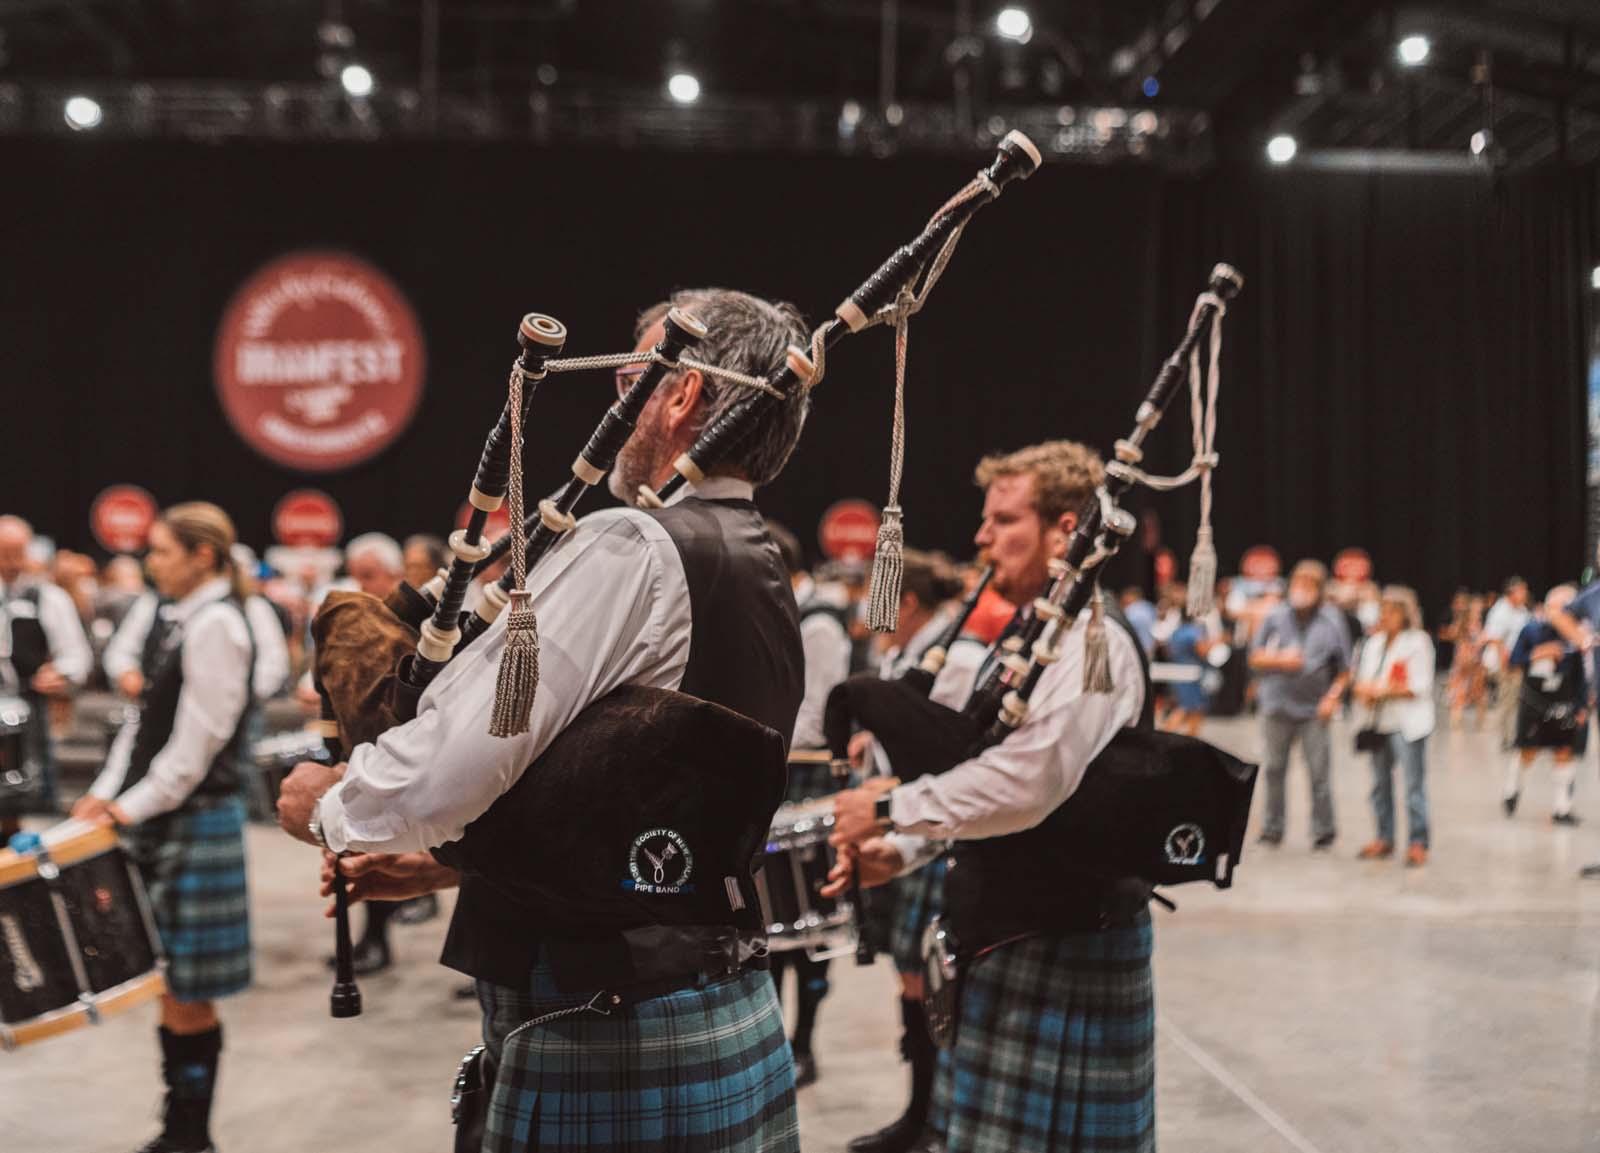 Dramfest 2018 for Whisky Galore-405.jpg